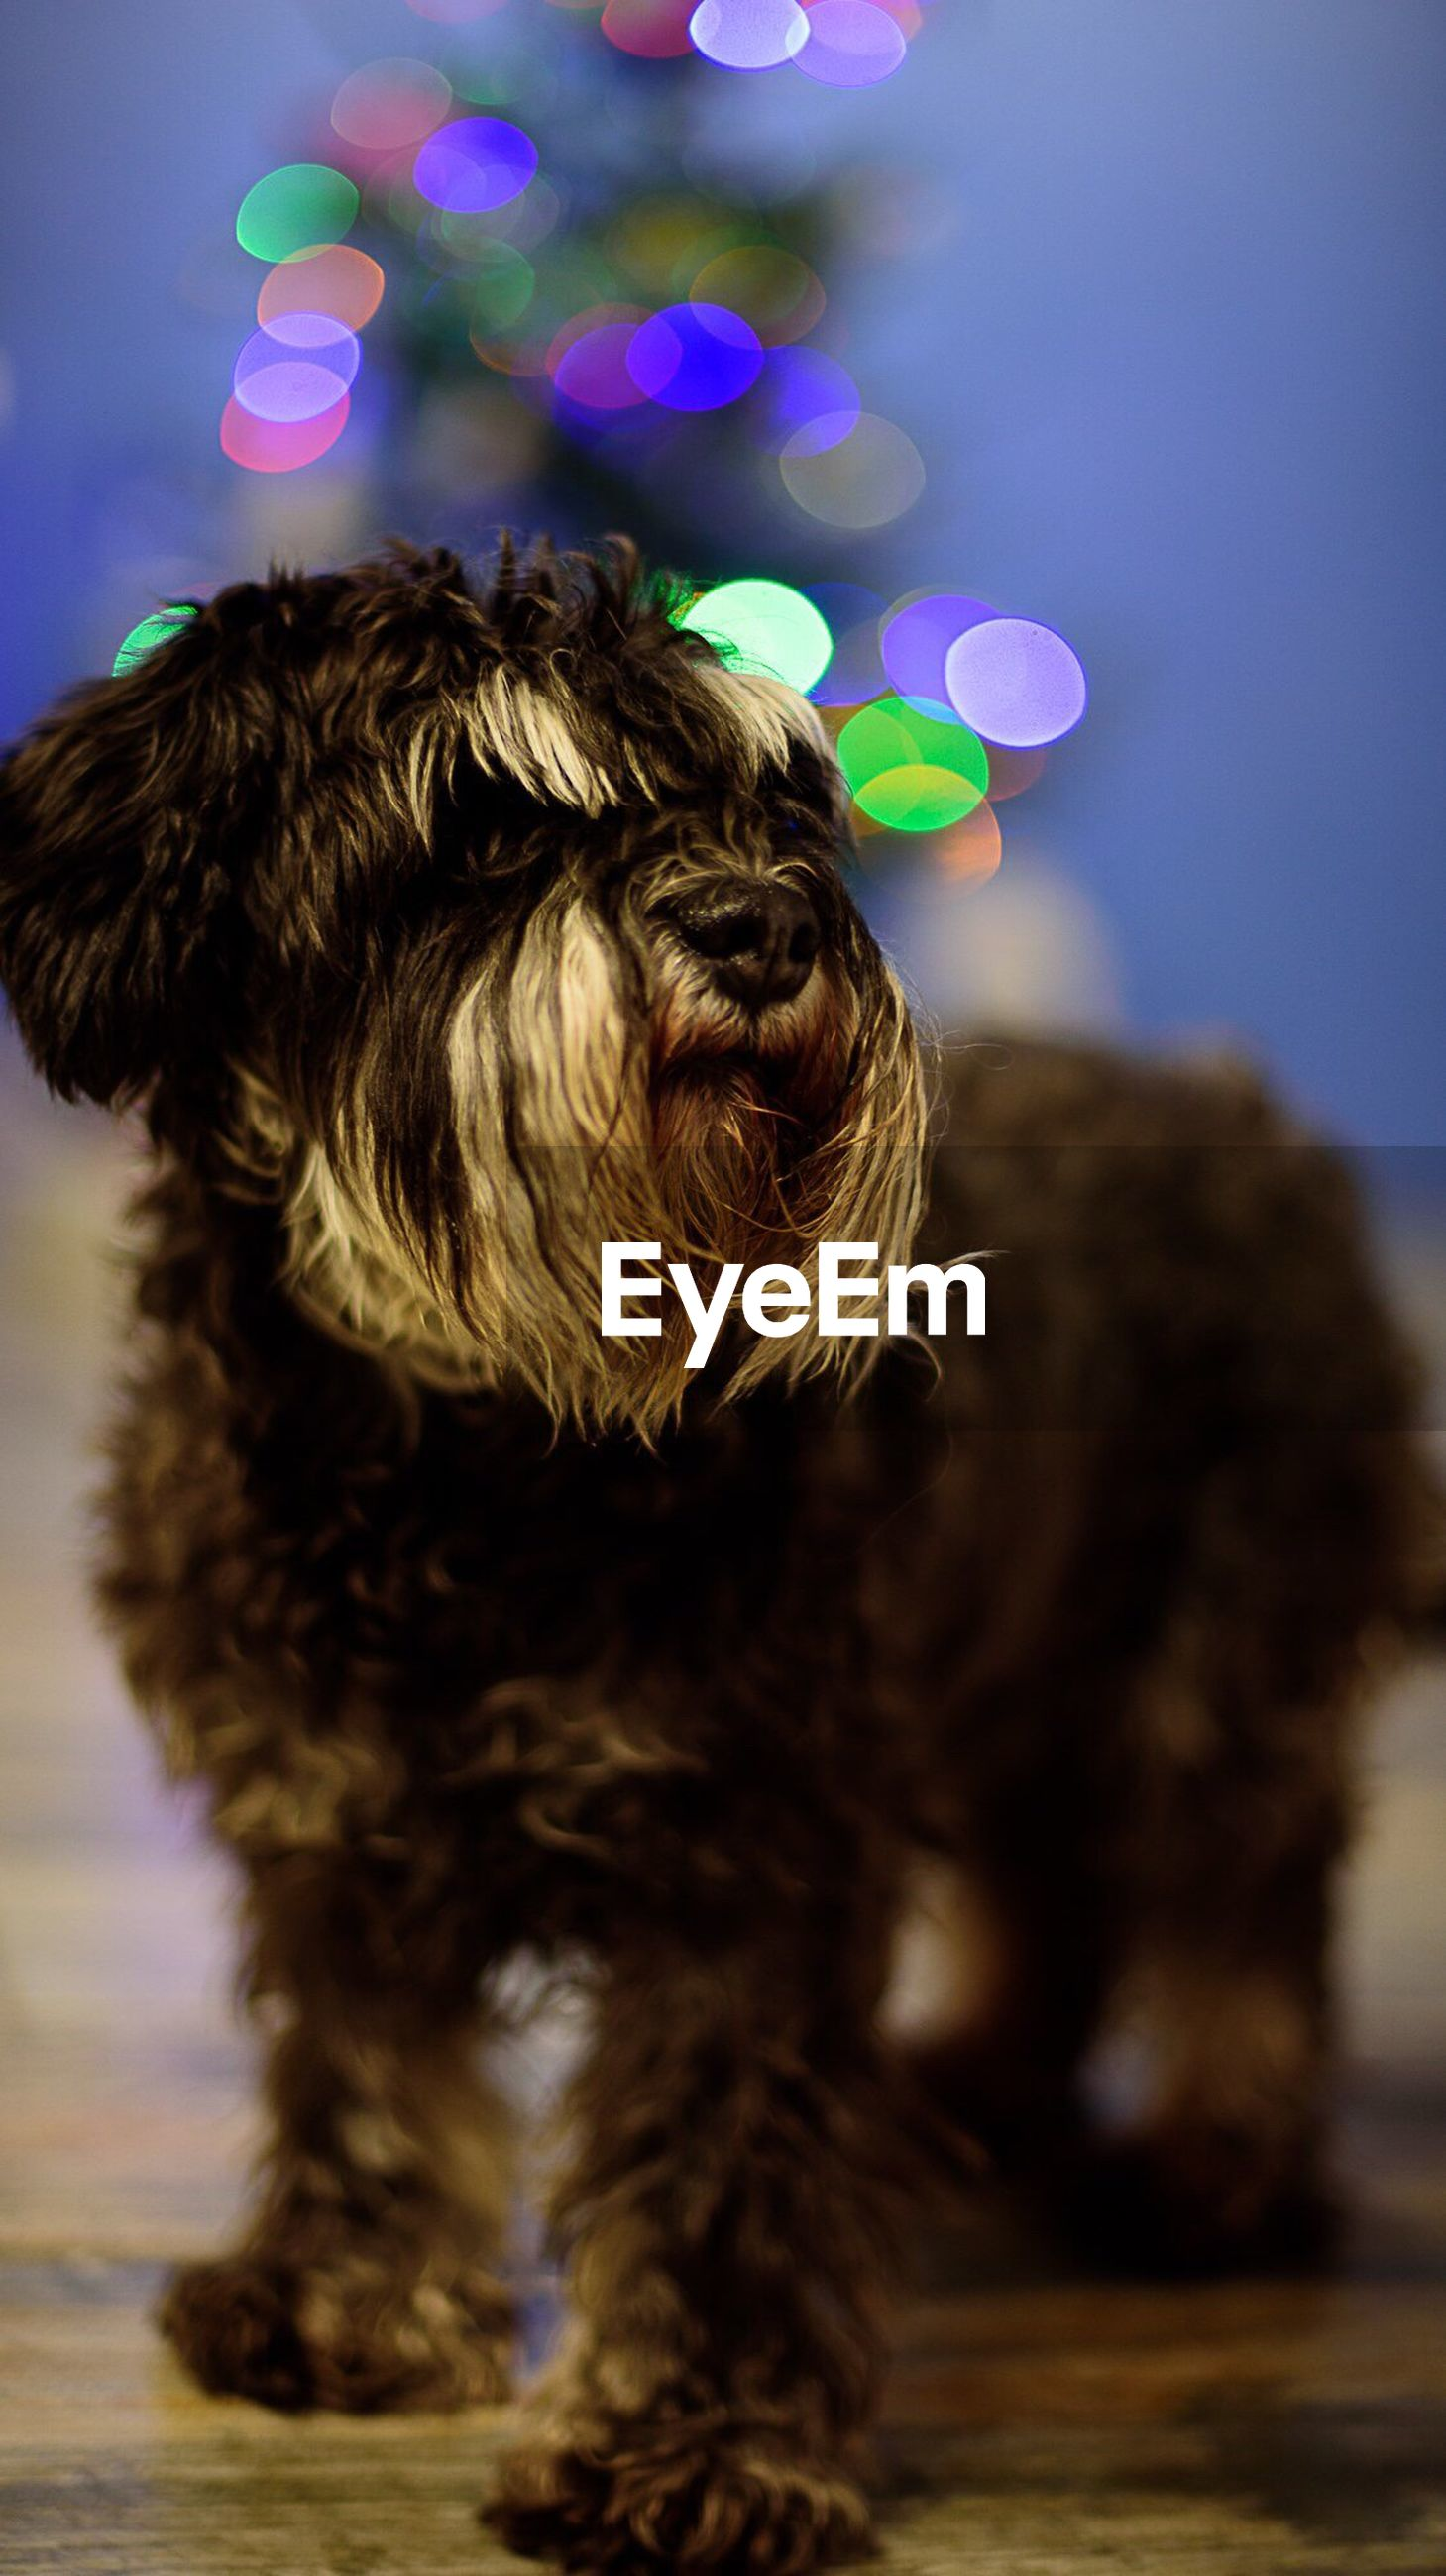 CLOSE-UP OF DOG WITH ILLUMINATED LIGHT